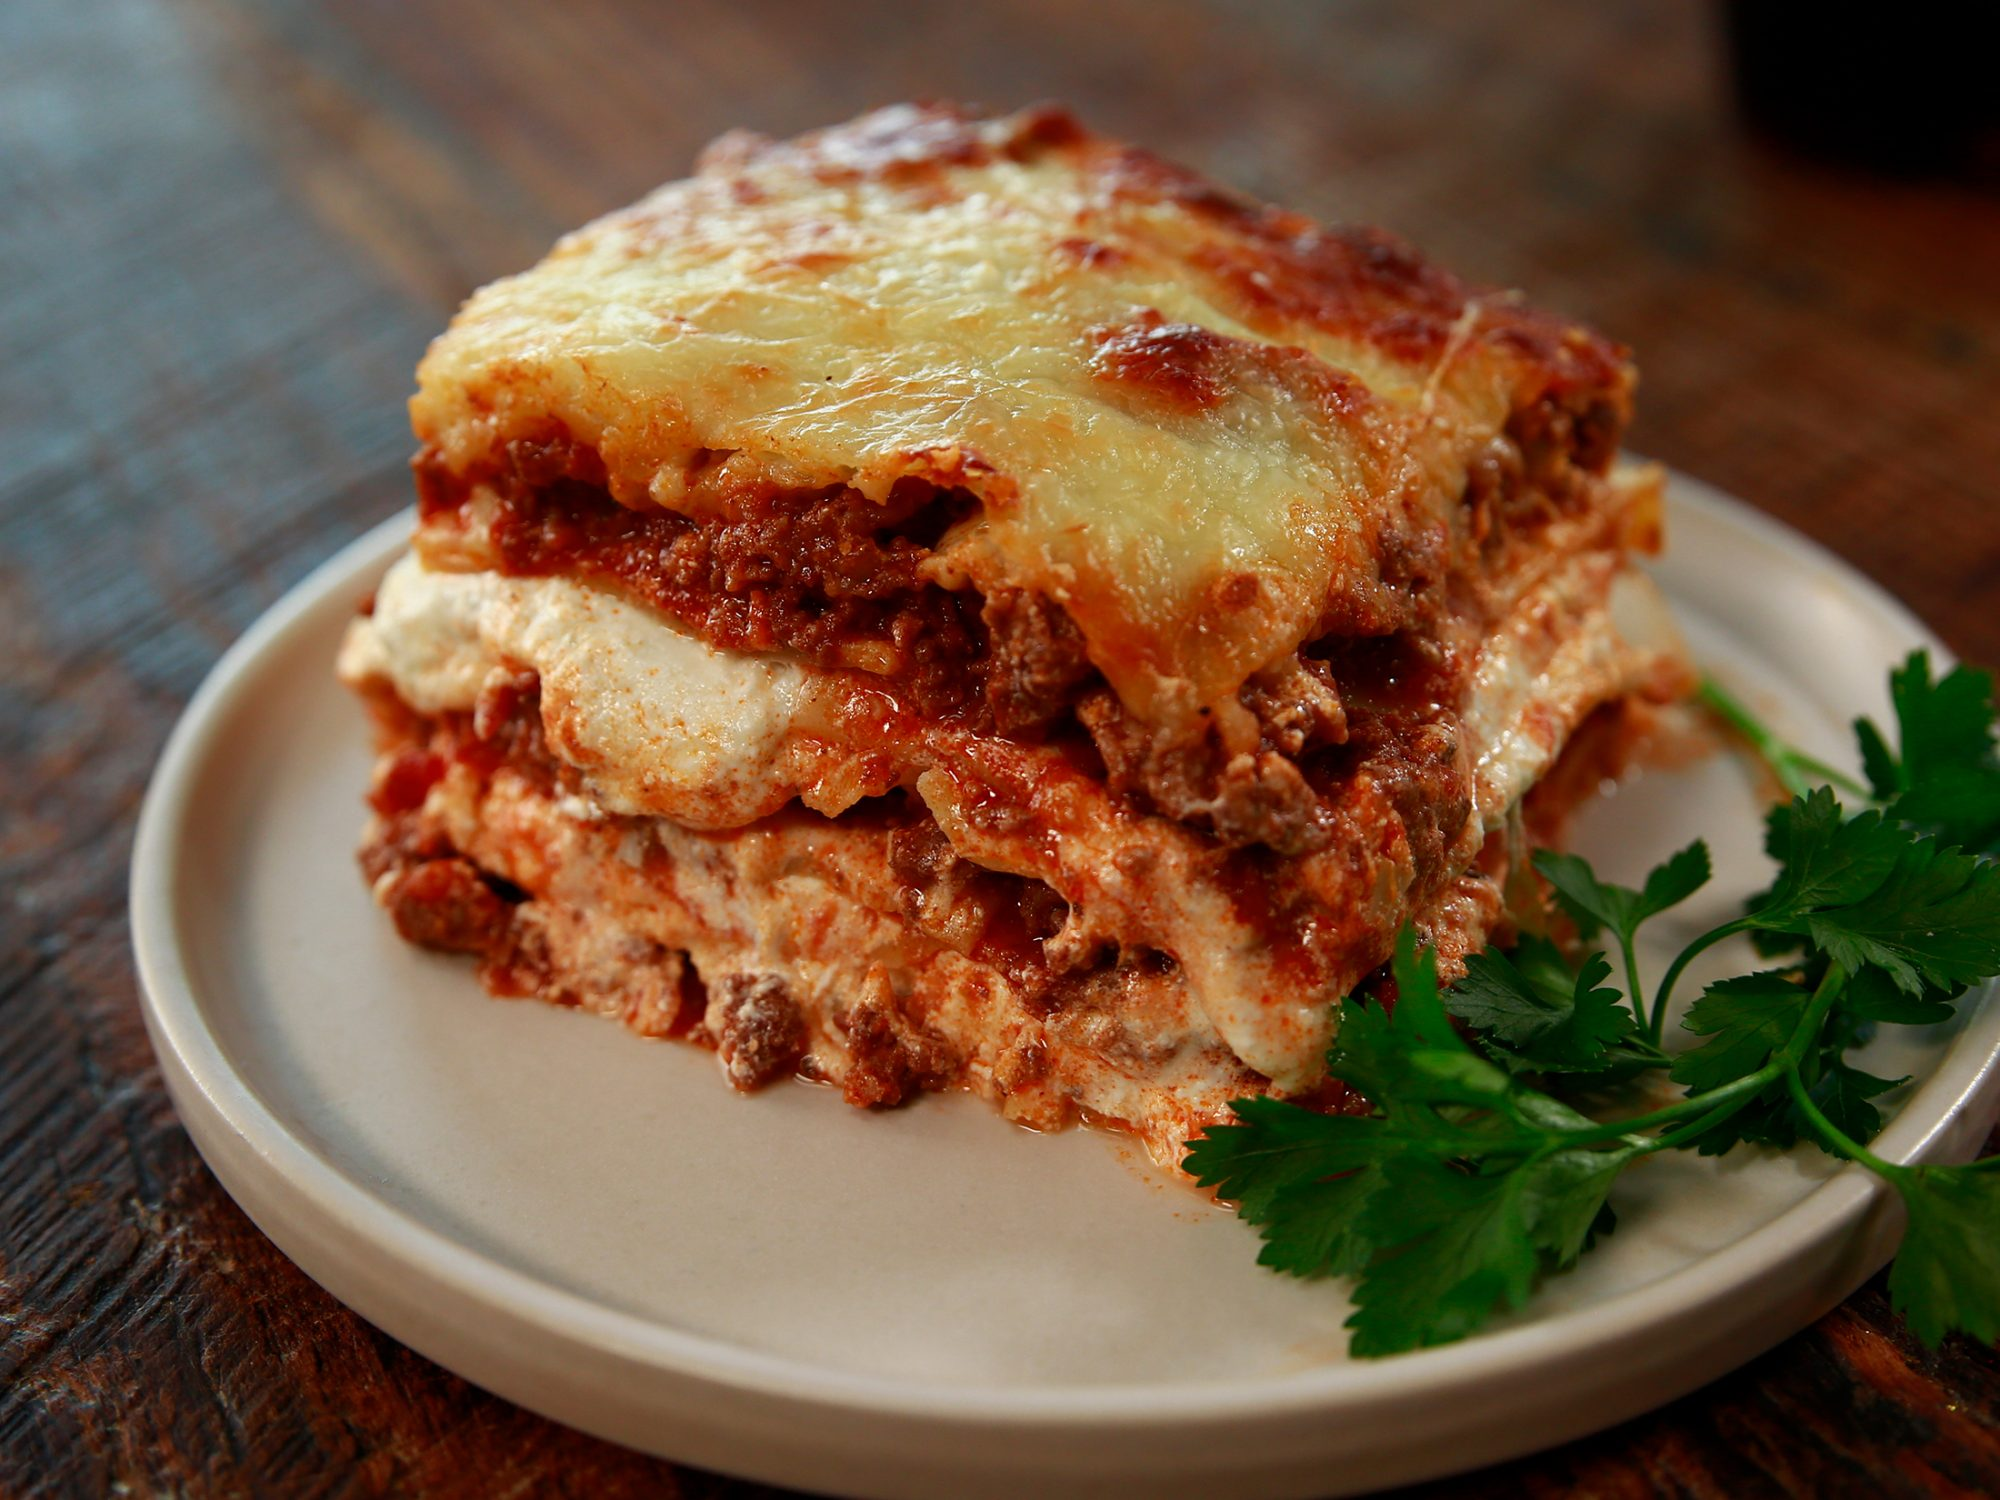 Paris Hilton's Lasagna (as interpreted by Nicole McLaughlin)